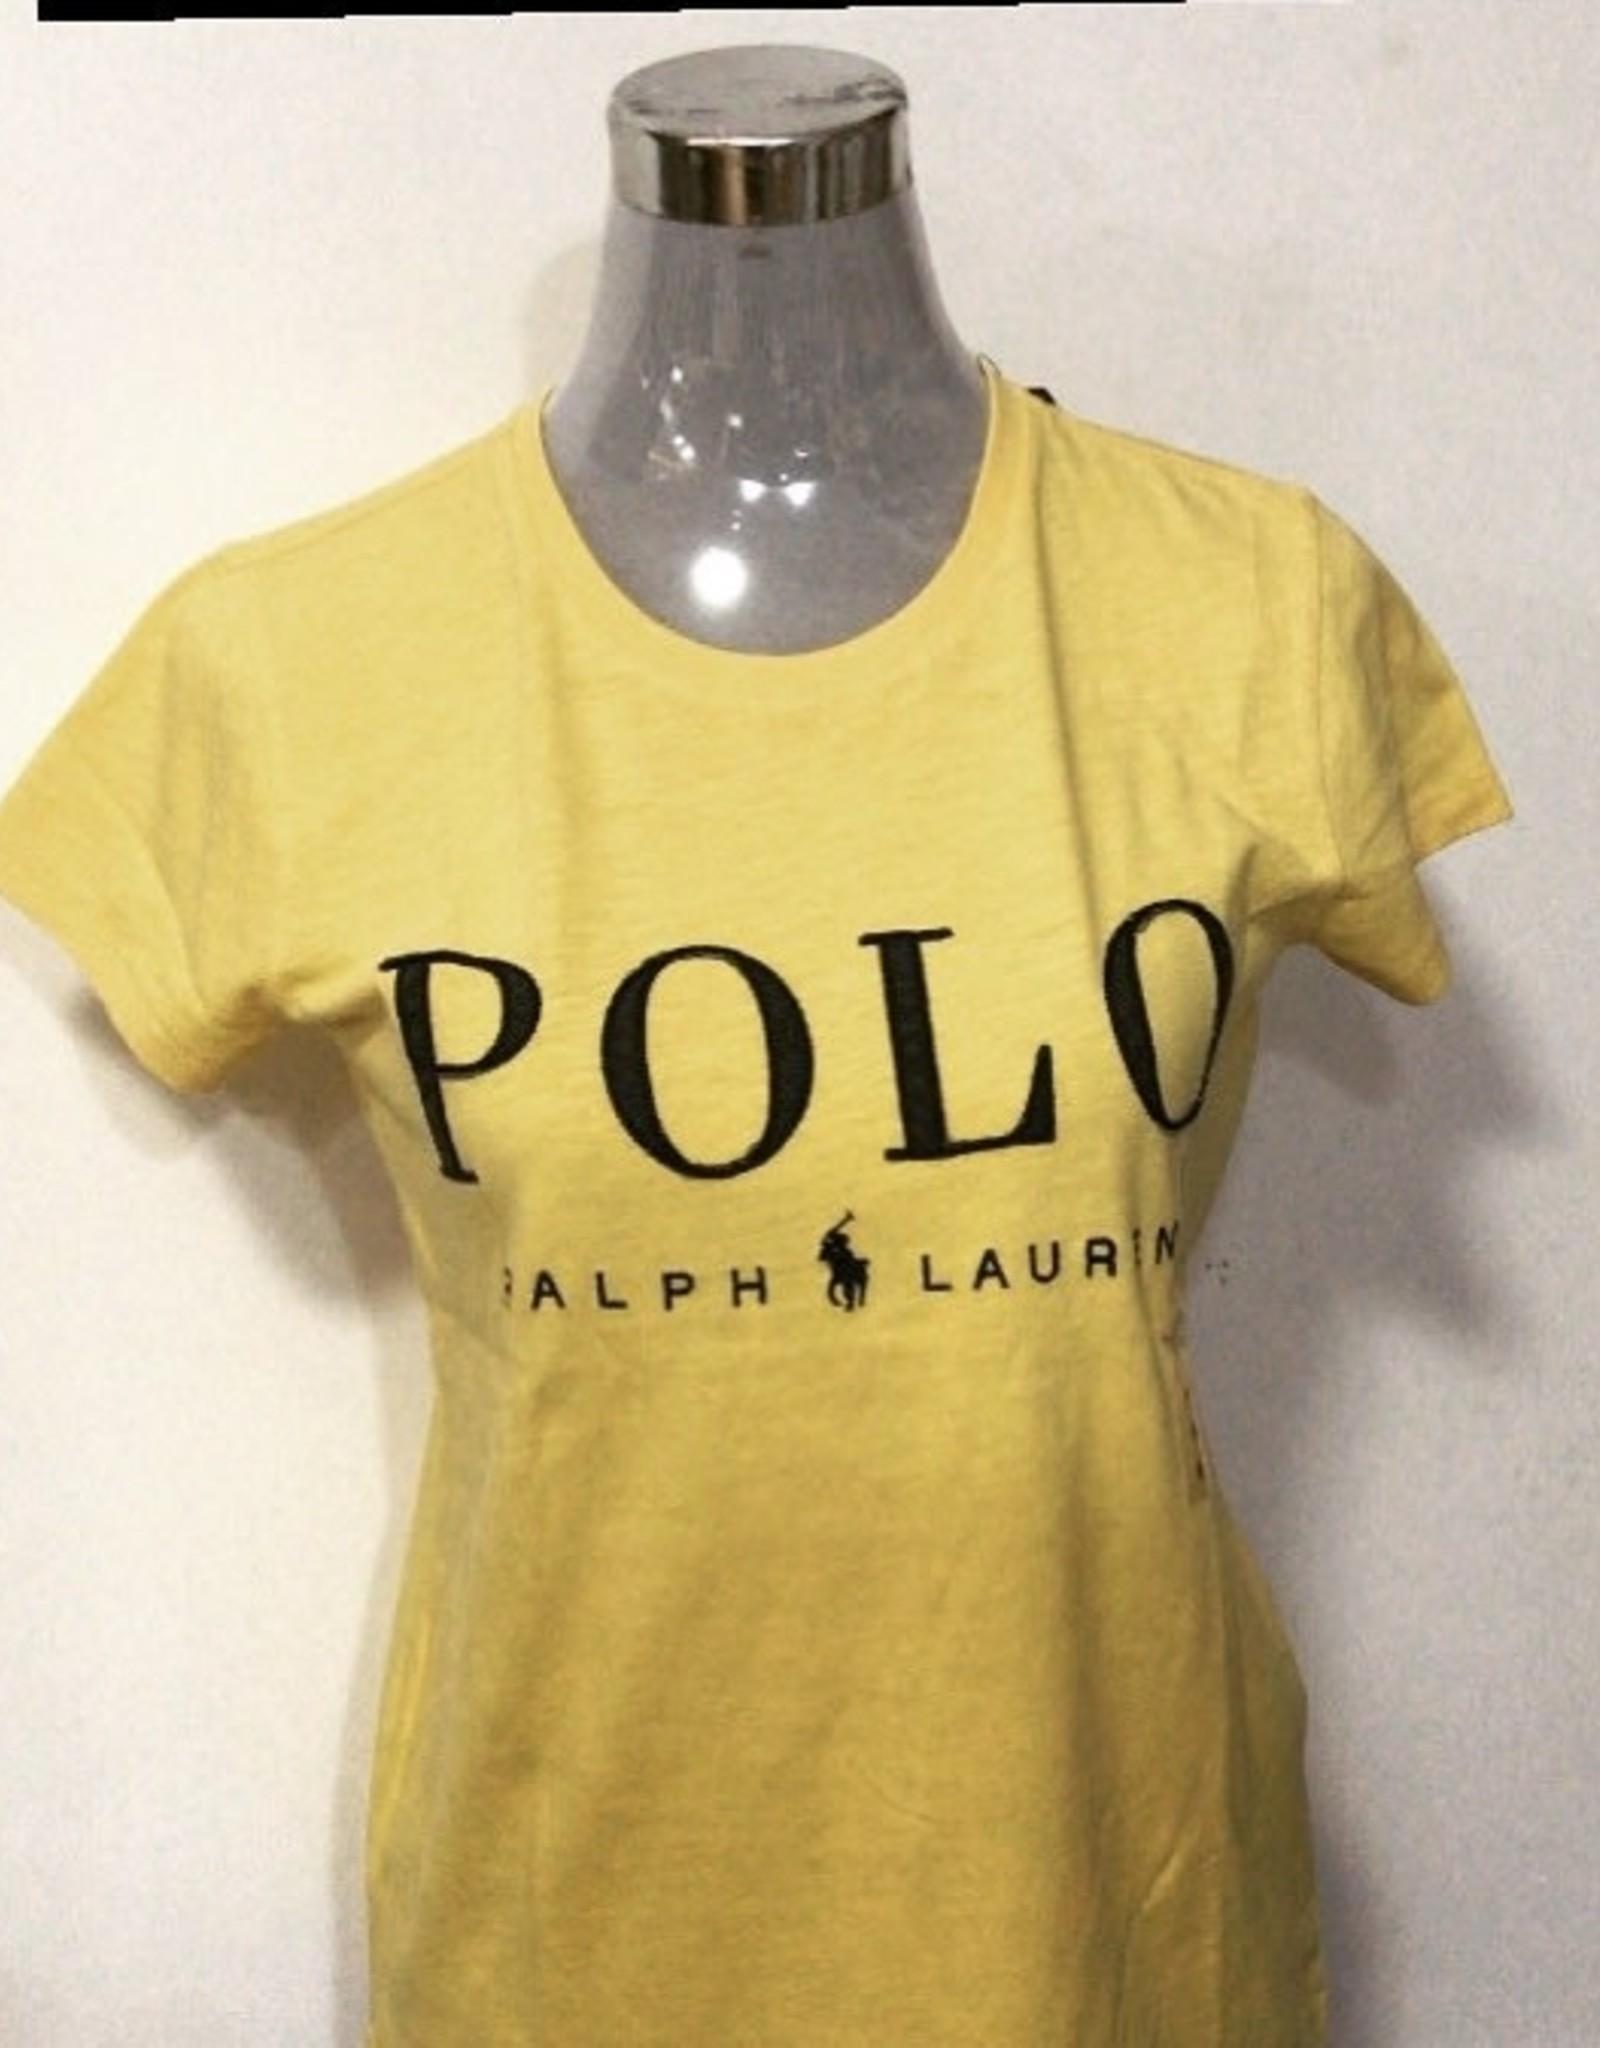 Polo Ralph Lauren Polo Ralph Lauren Tees